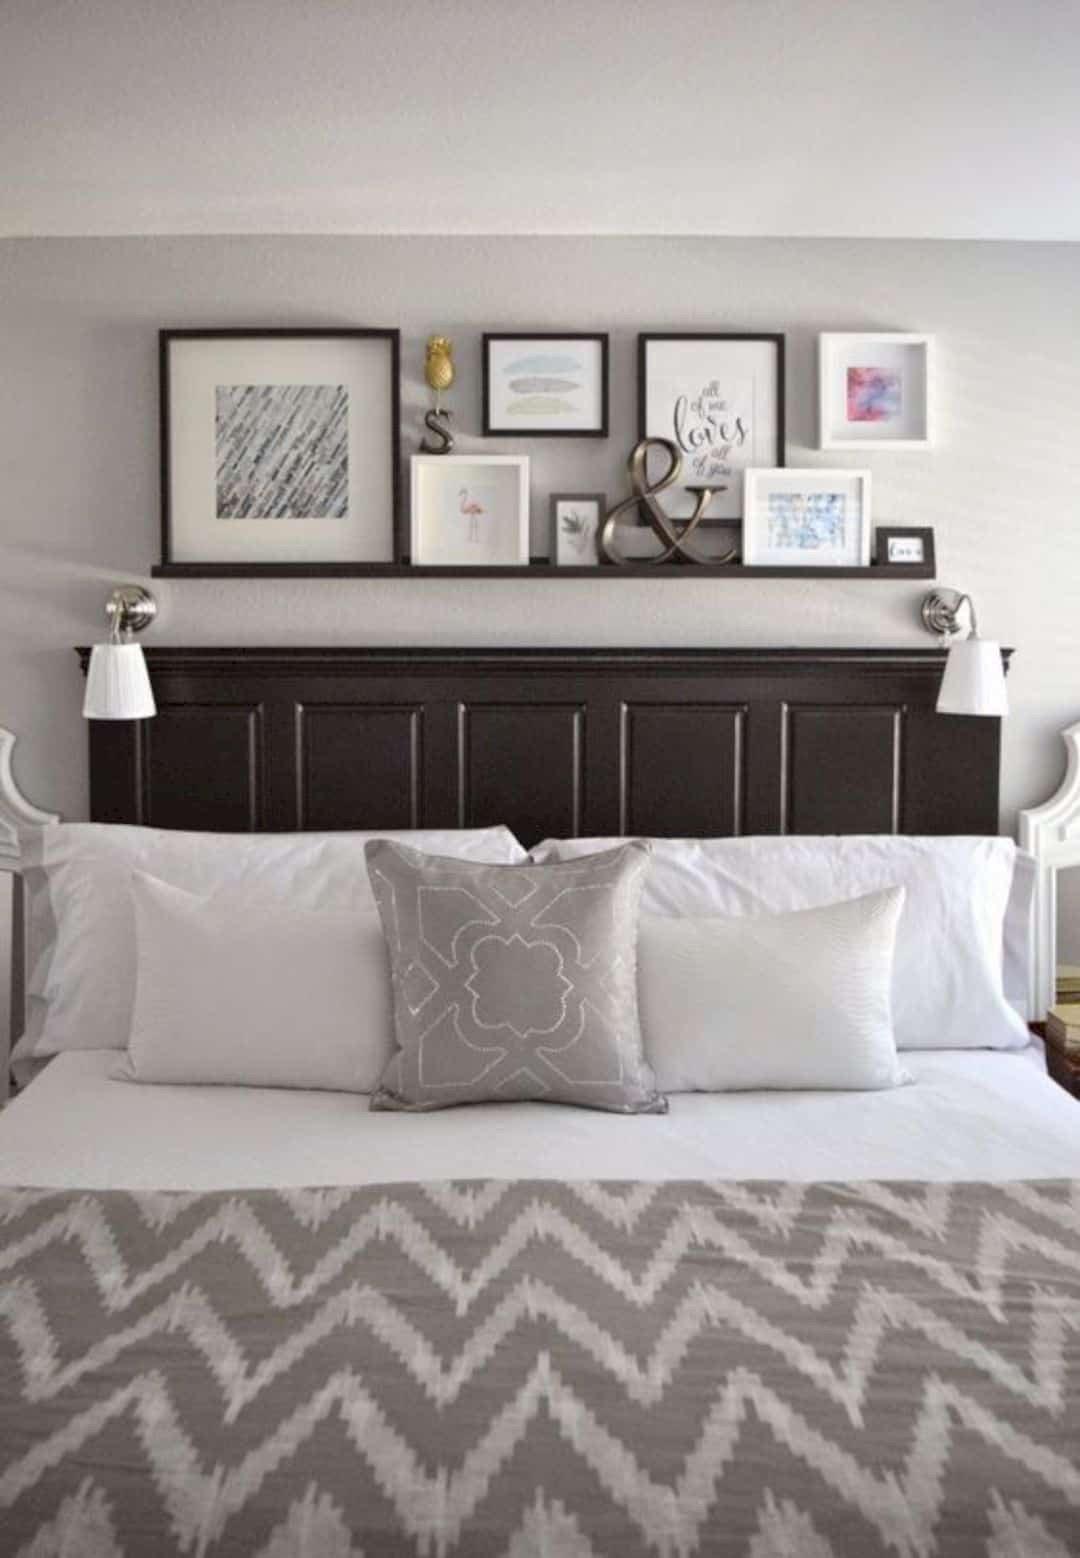 Wall Decor Ideas for Bedroom Beautiful 16 Fantastic Master Bedroom Decorating Ideas